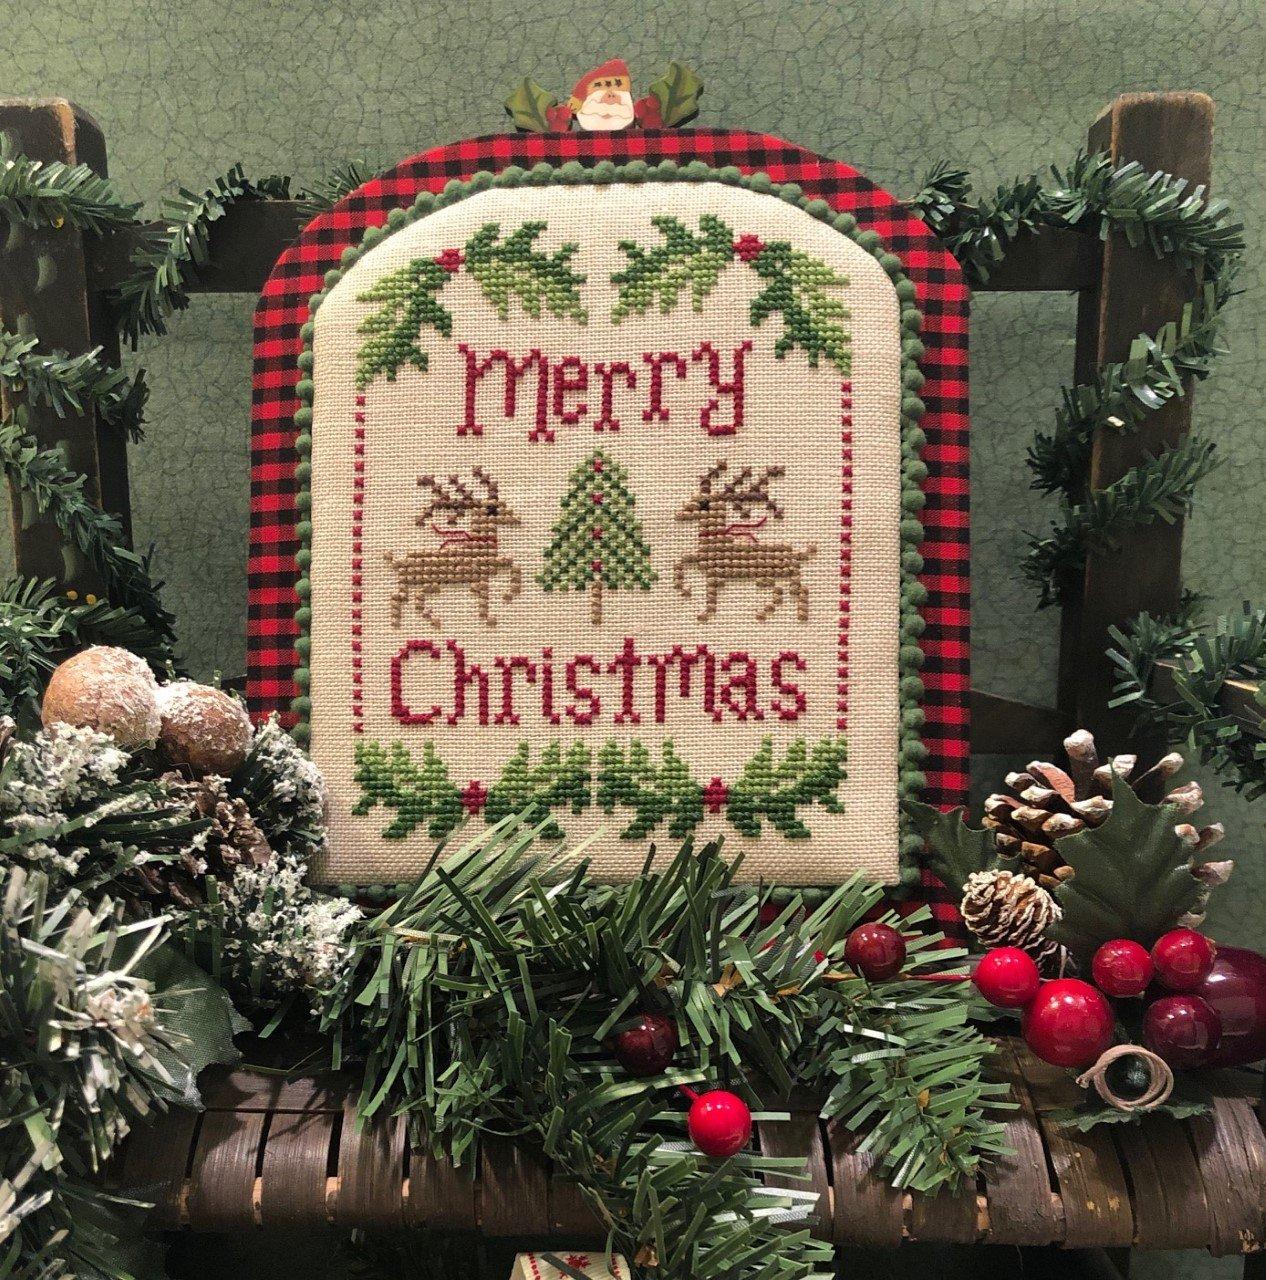 ScissorTail Designs - Merry Christmas Deer